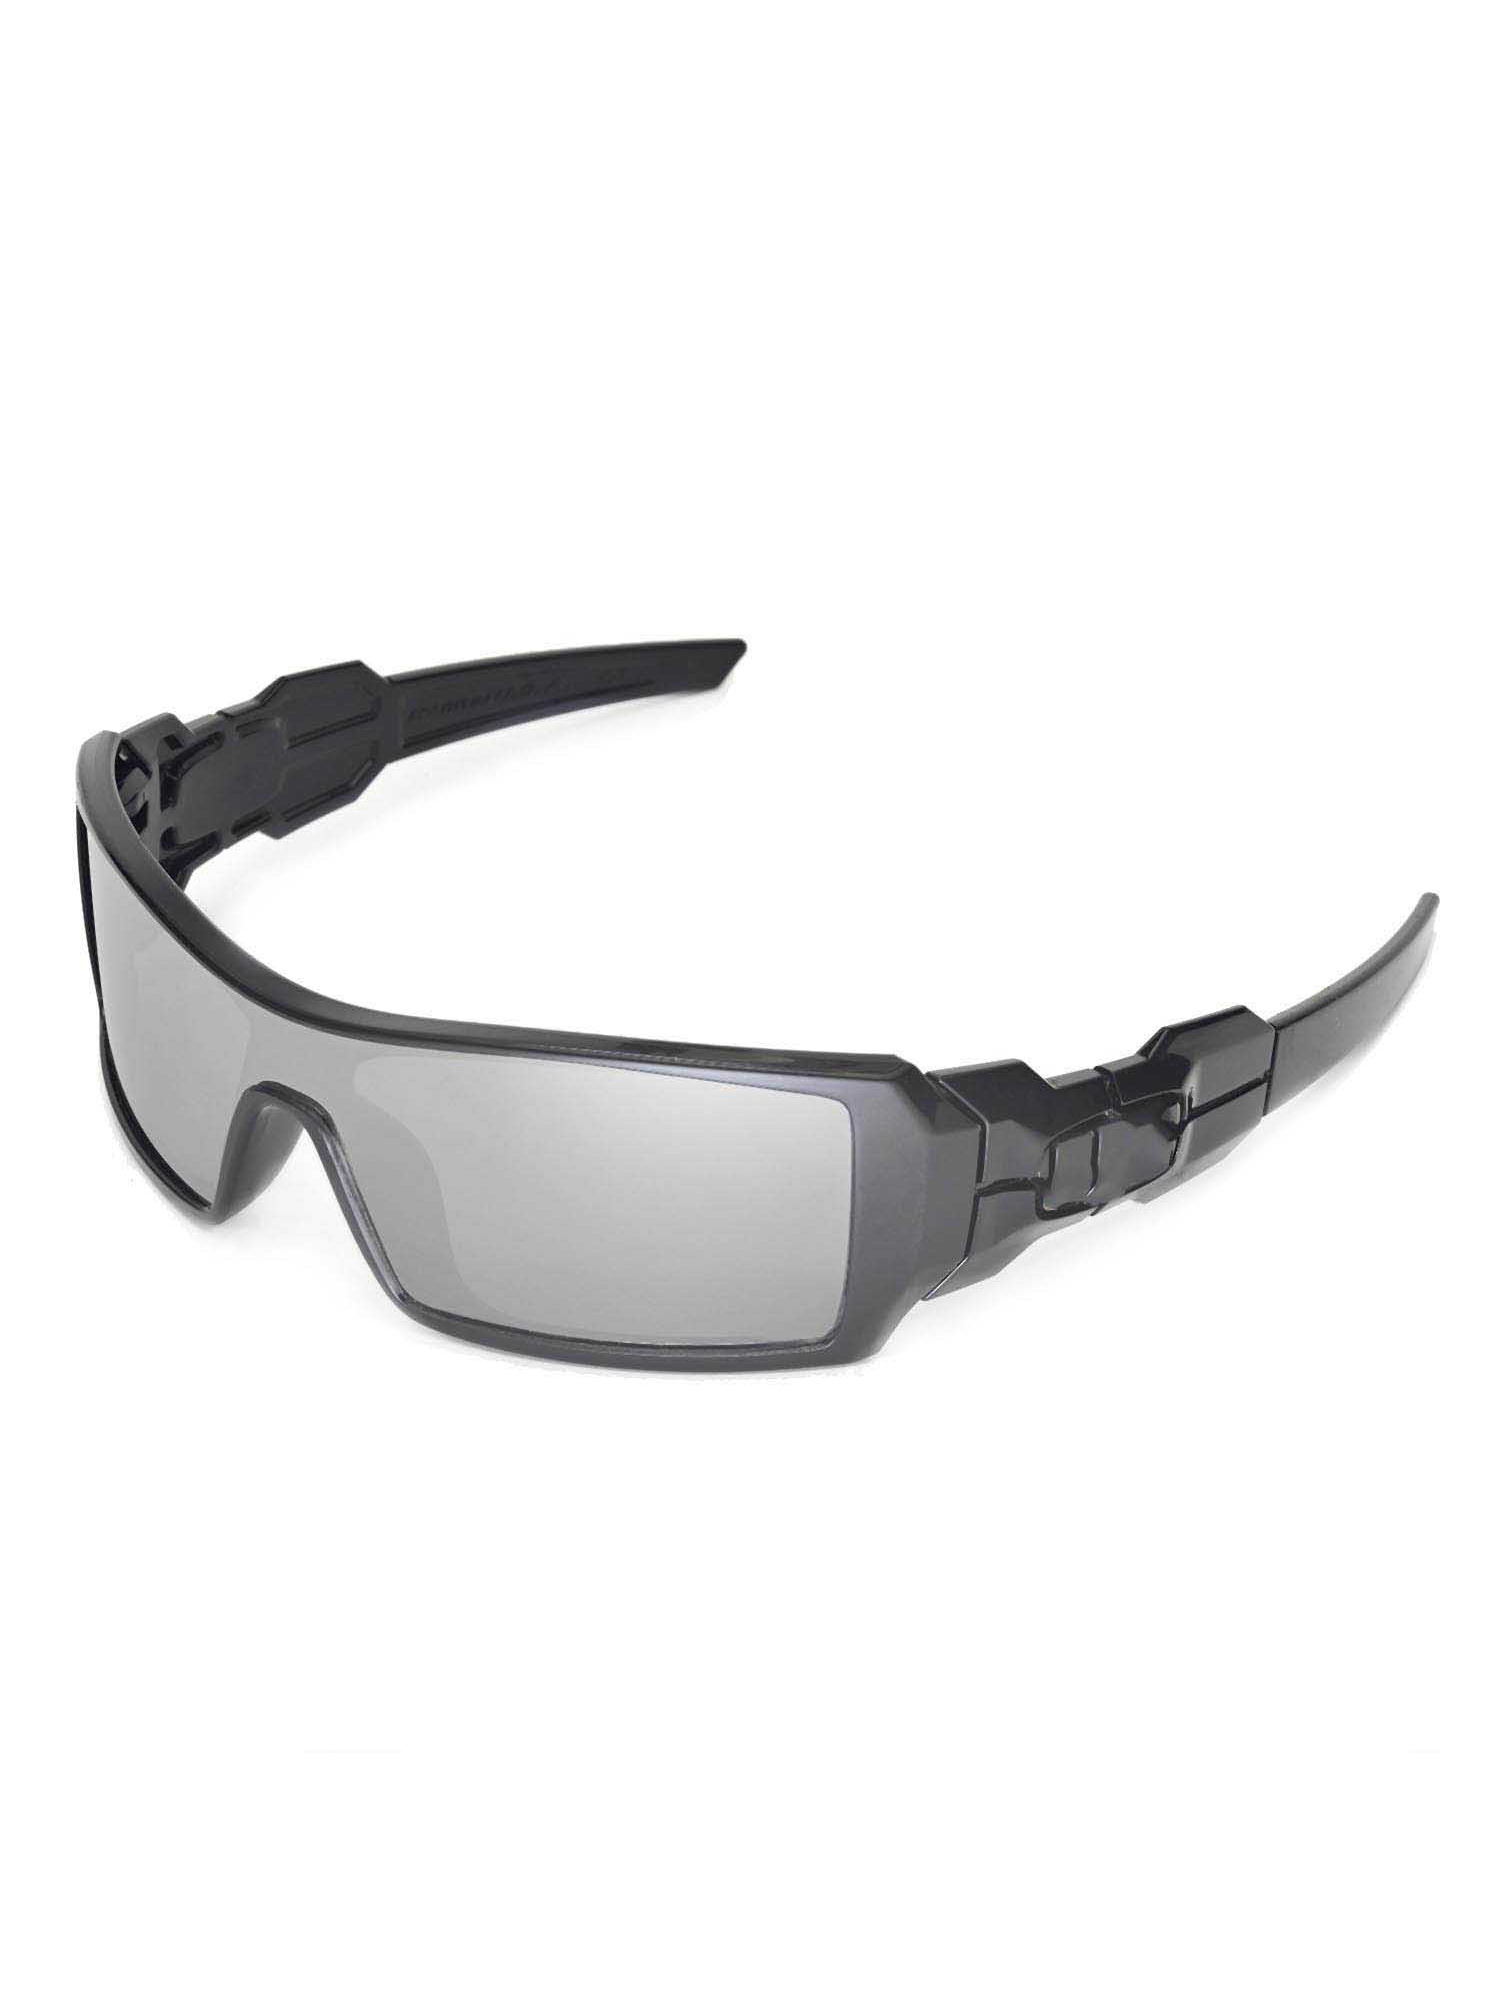 514995e810 Walleva Ice Blue Polarized Replacement Lenses for Oakley Oil Rig Sunglasses